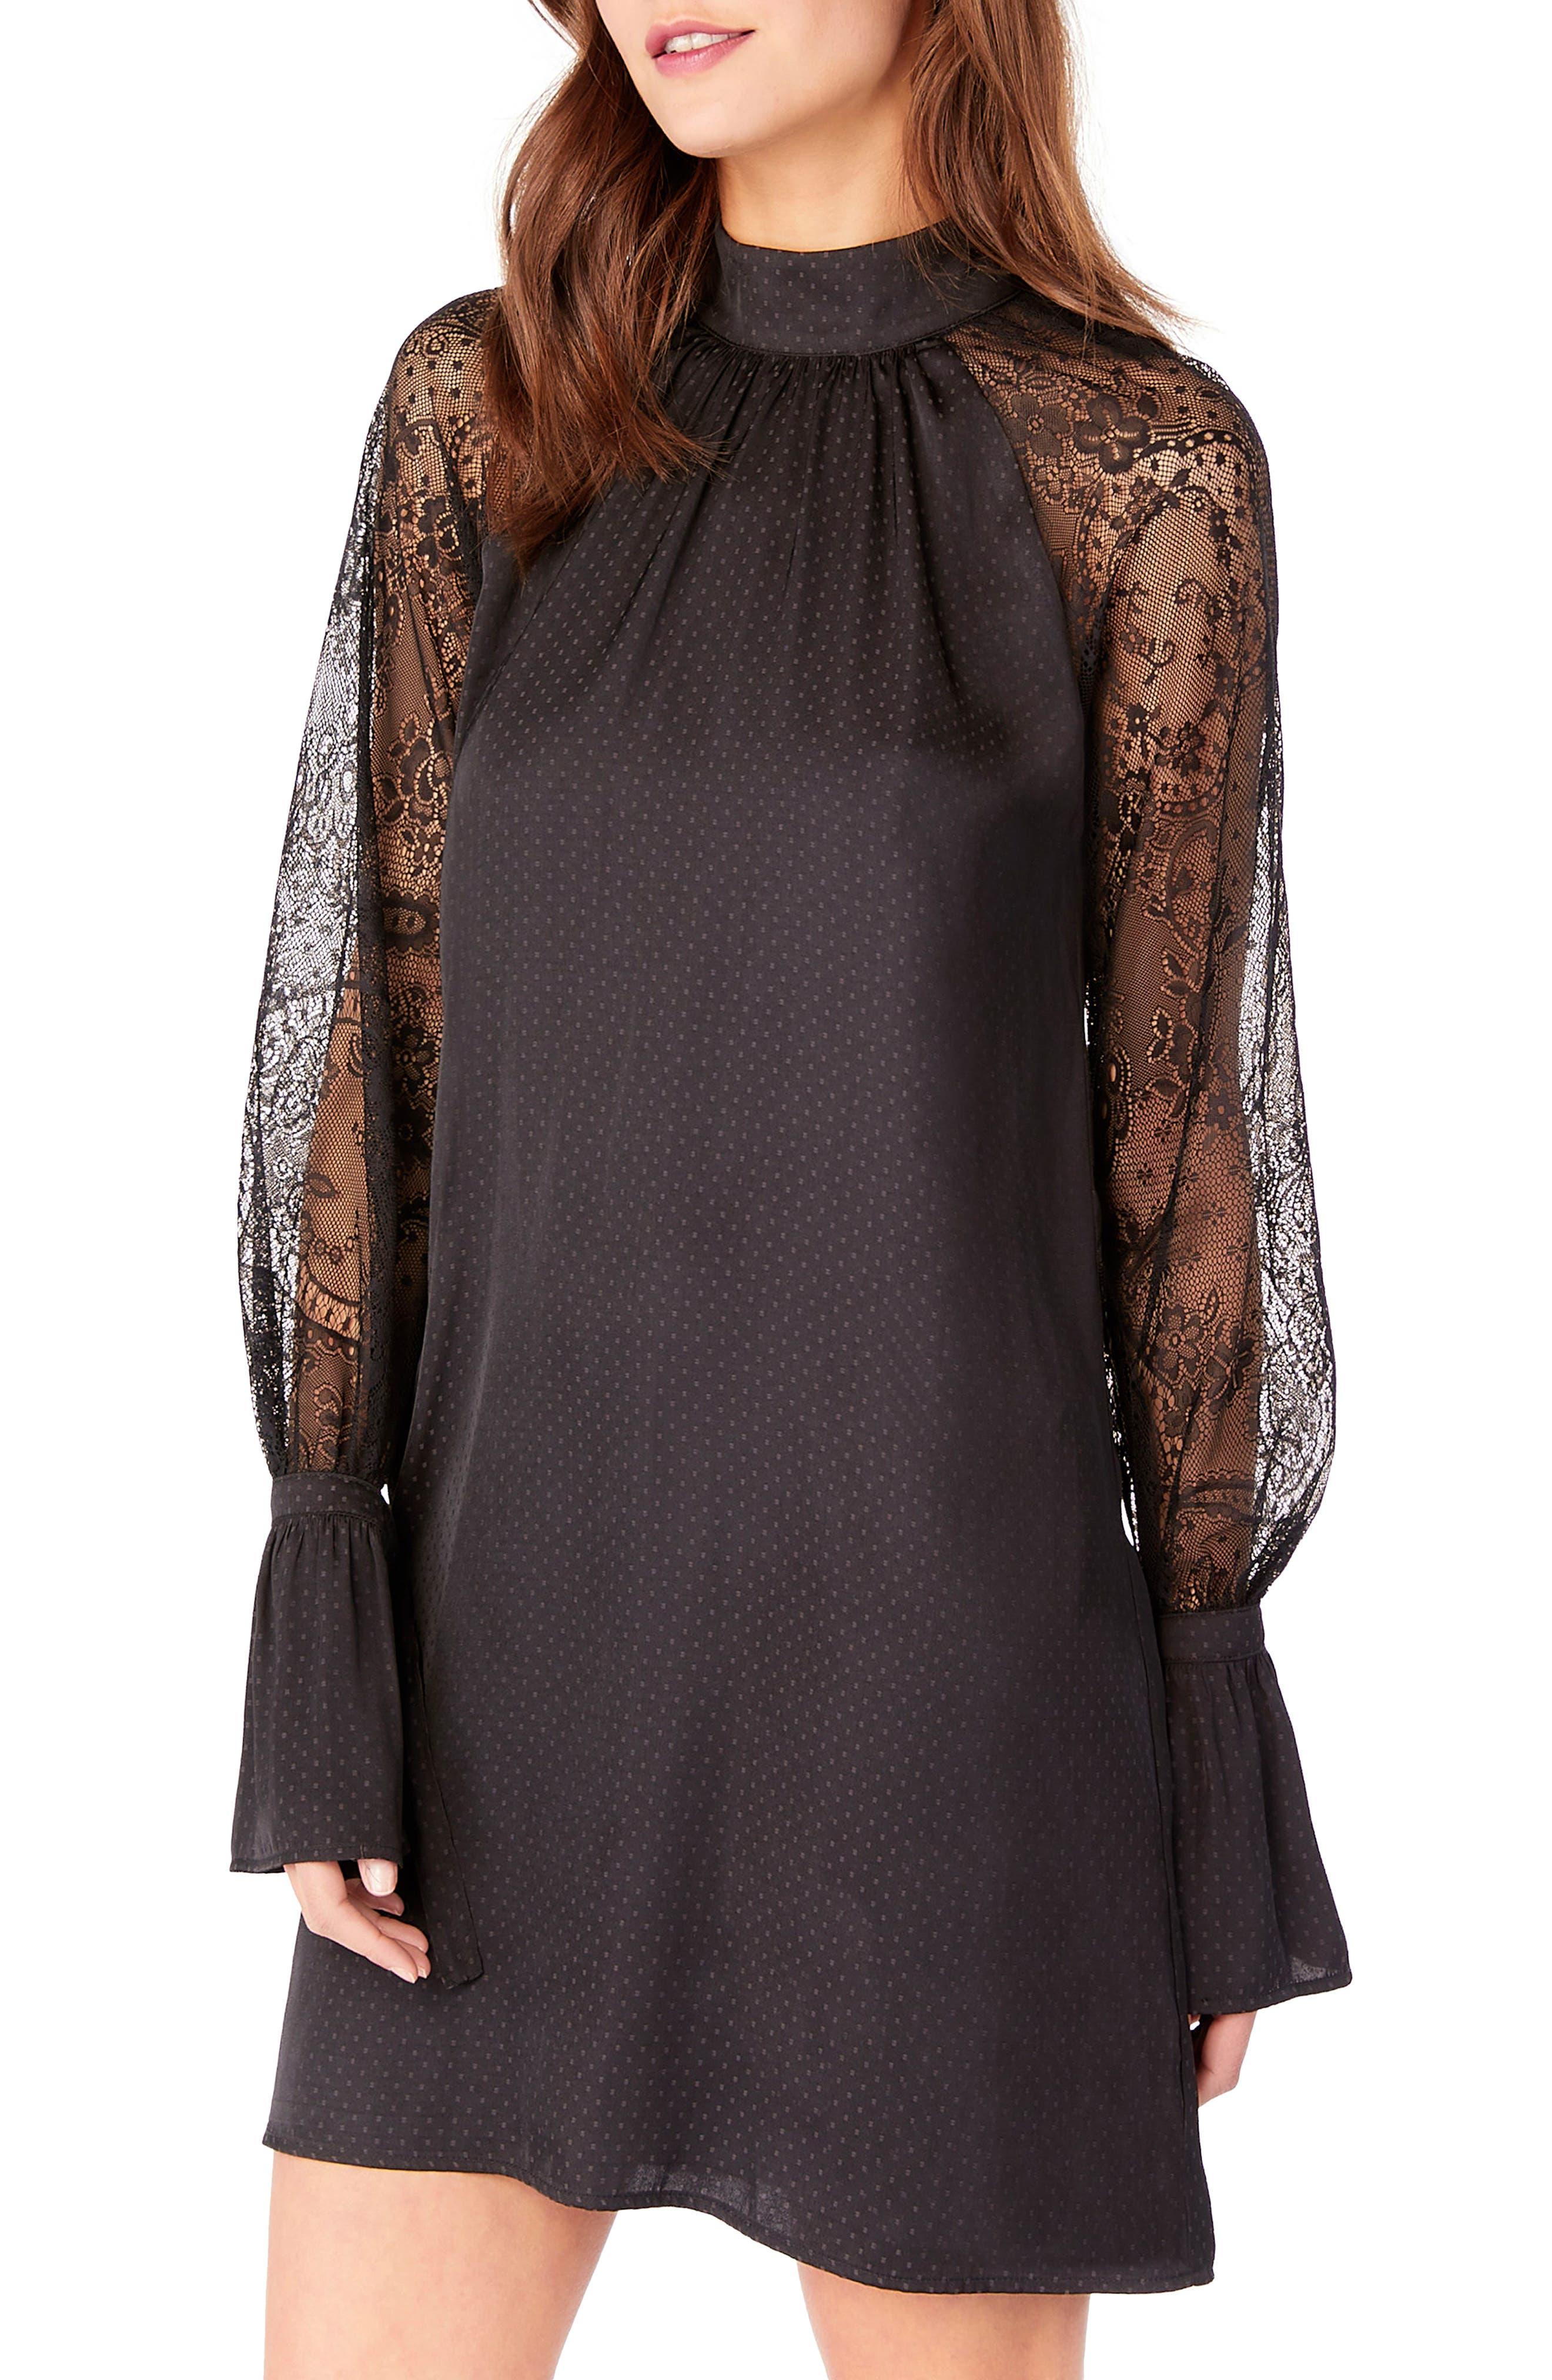 Lace Bell Sleeve Shift Dress,                             Main thumbnail 1, color,                             Black